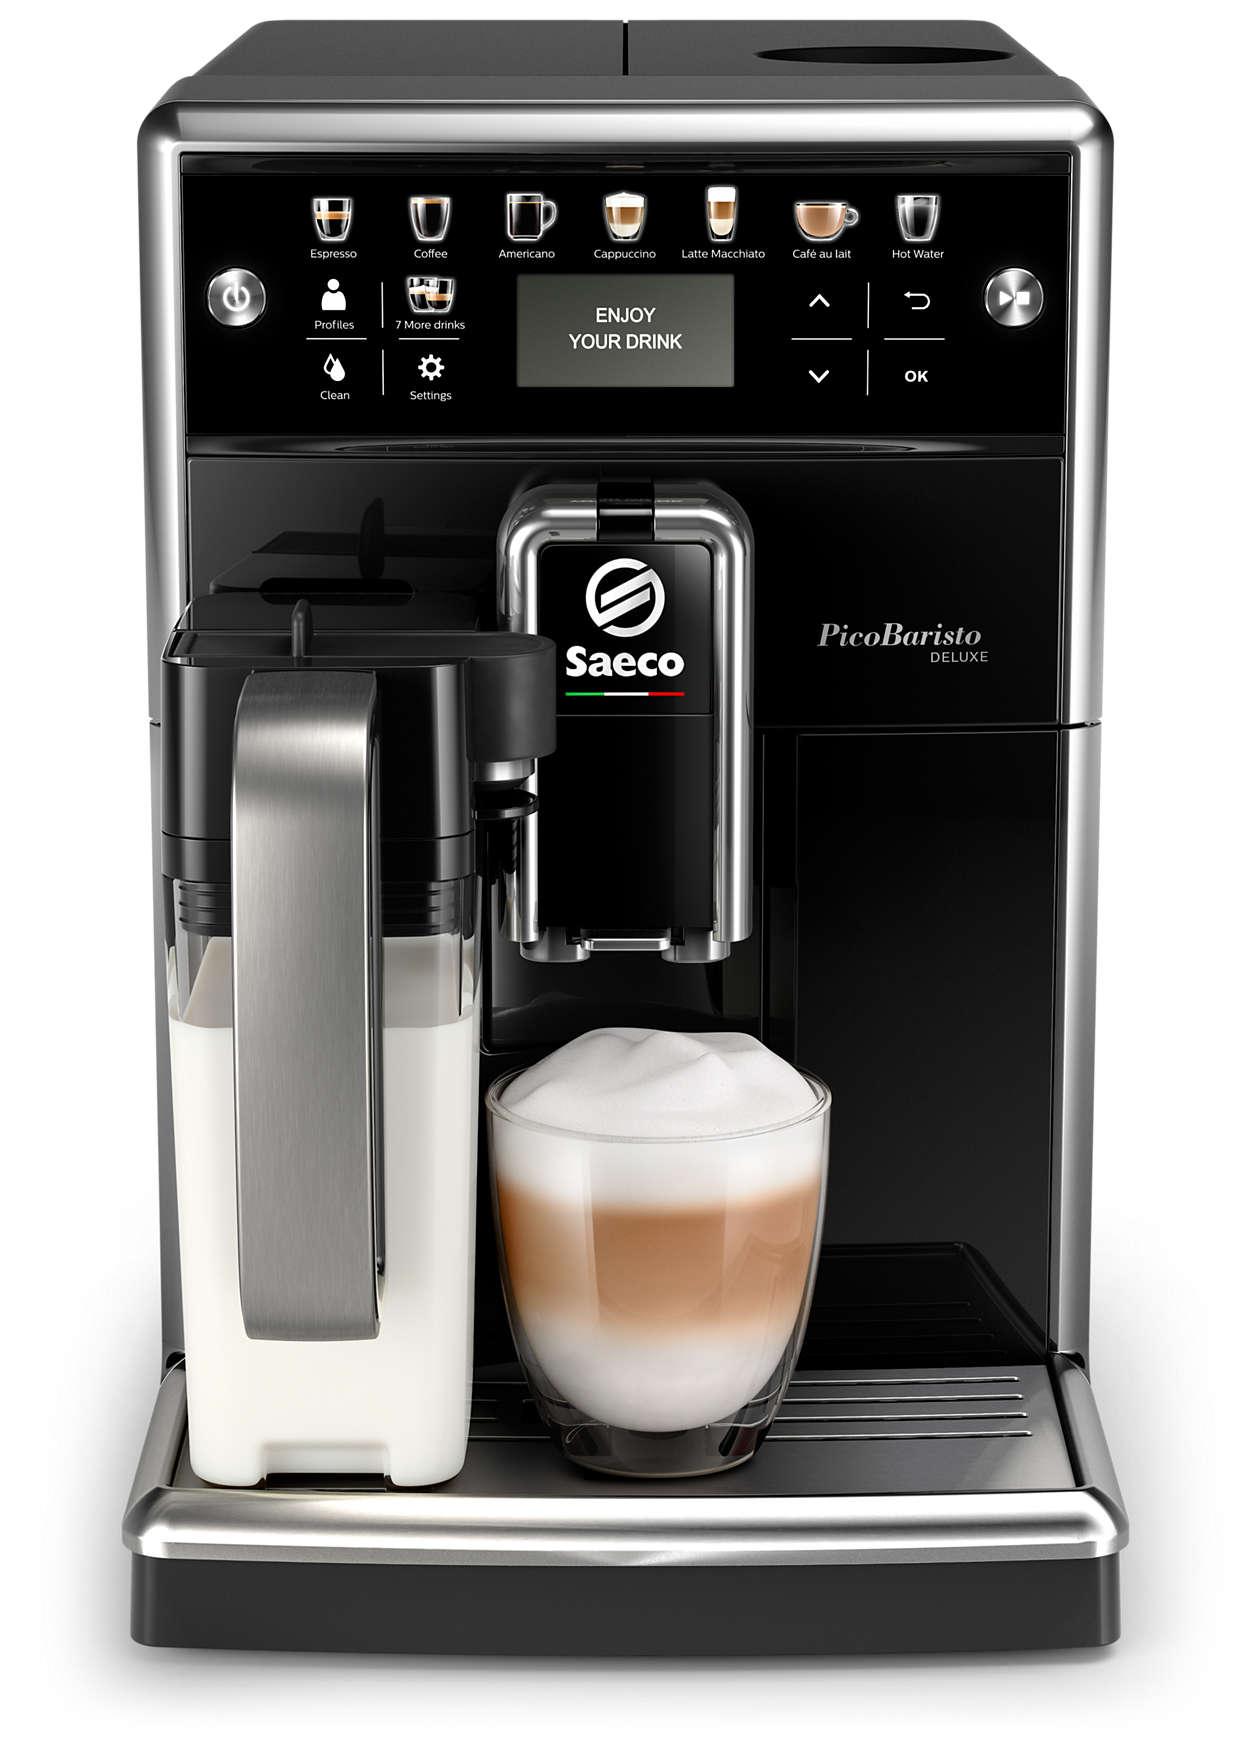 Вишукана кава, легко створена до Вашого смаку